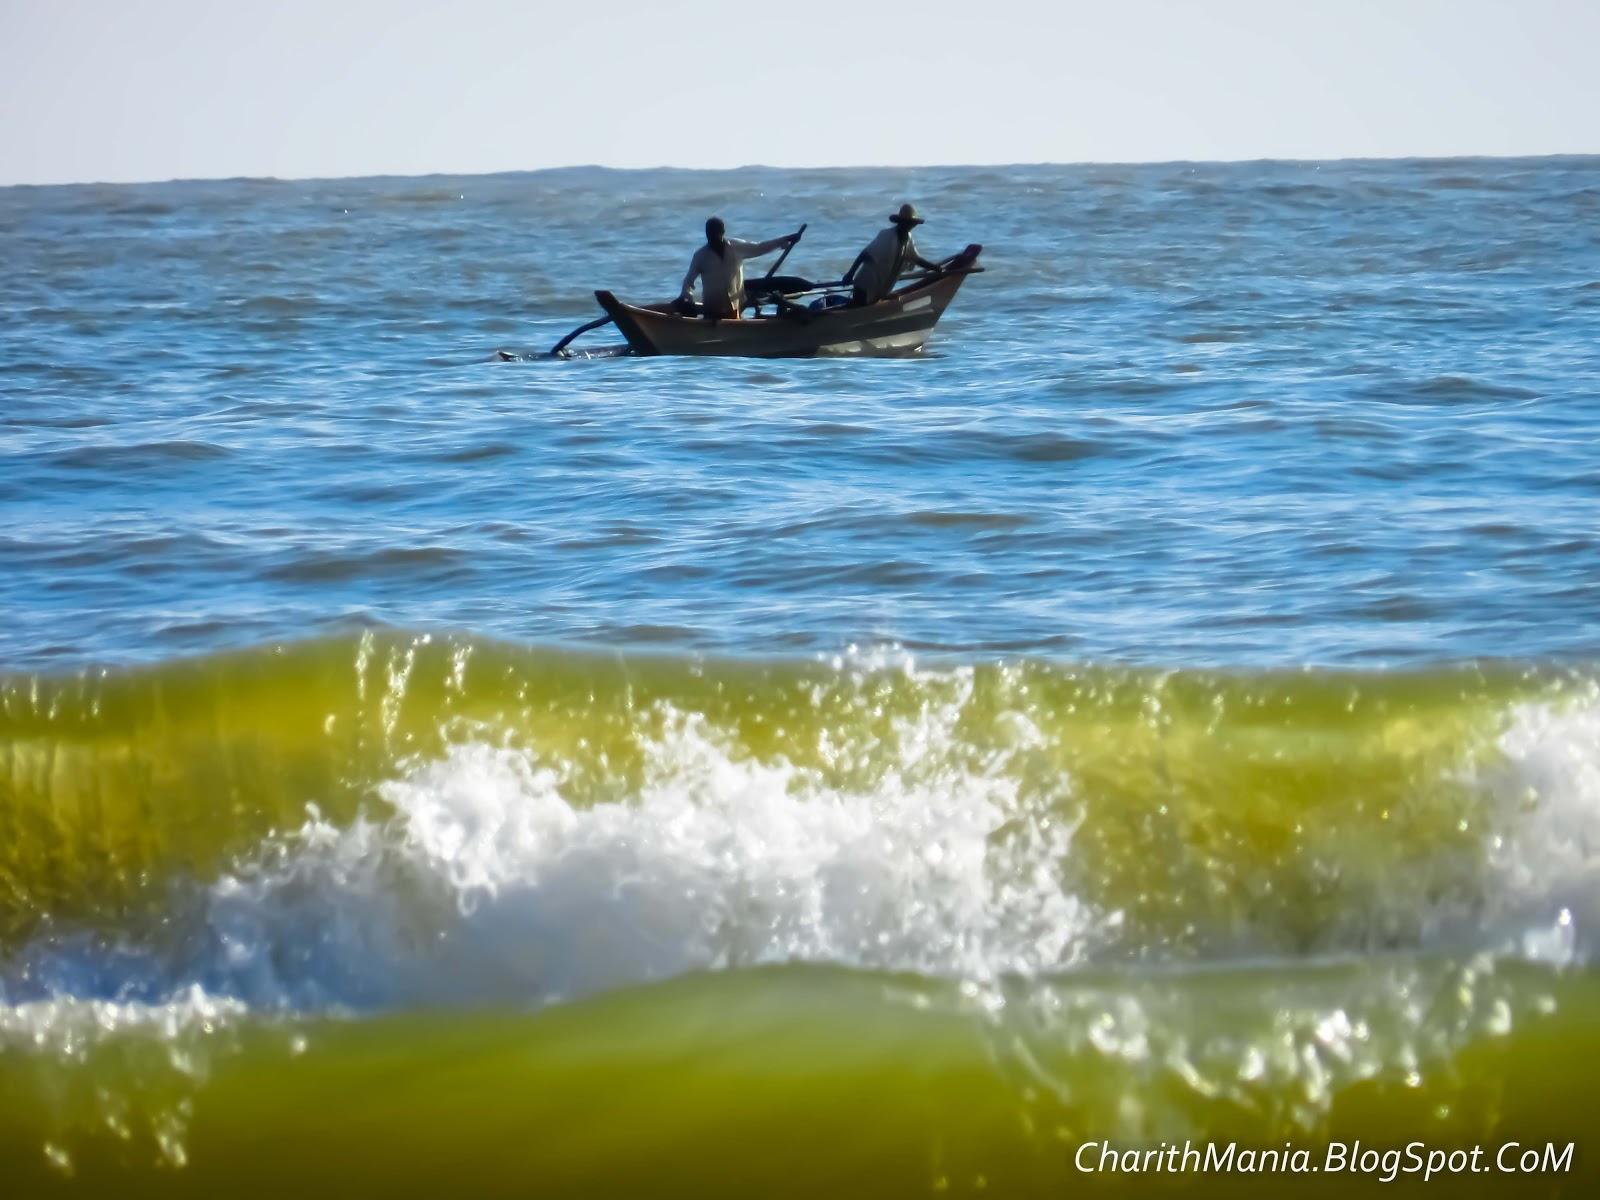 Charithmania fishing best beaches in sri lanka for Sri lanka fishing